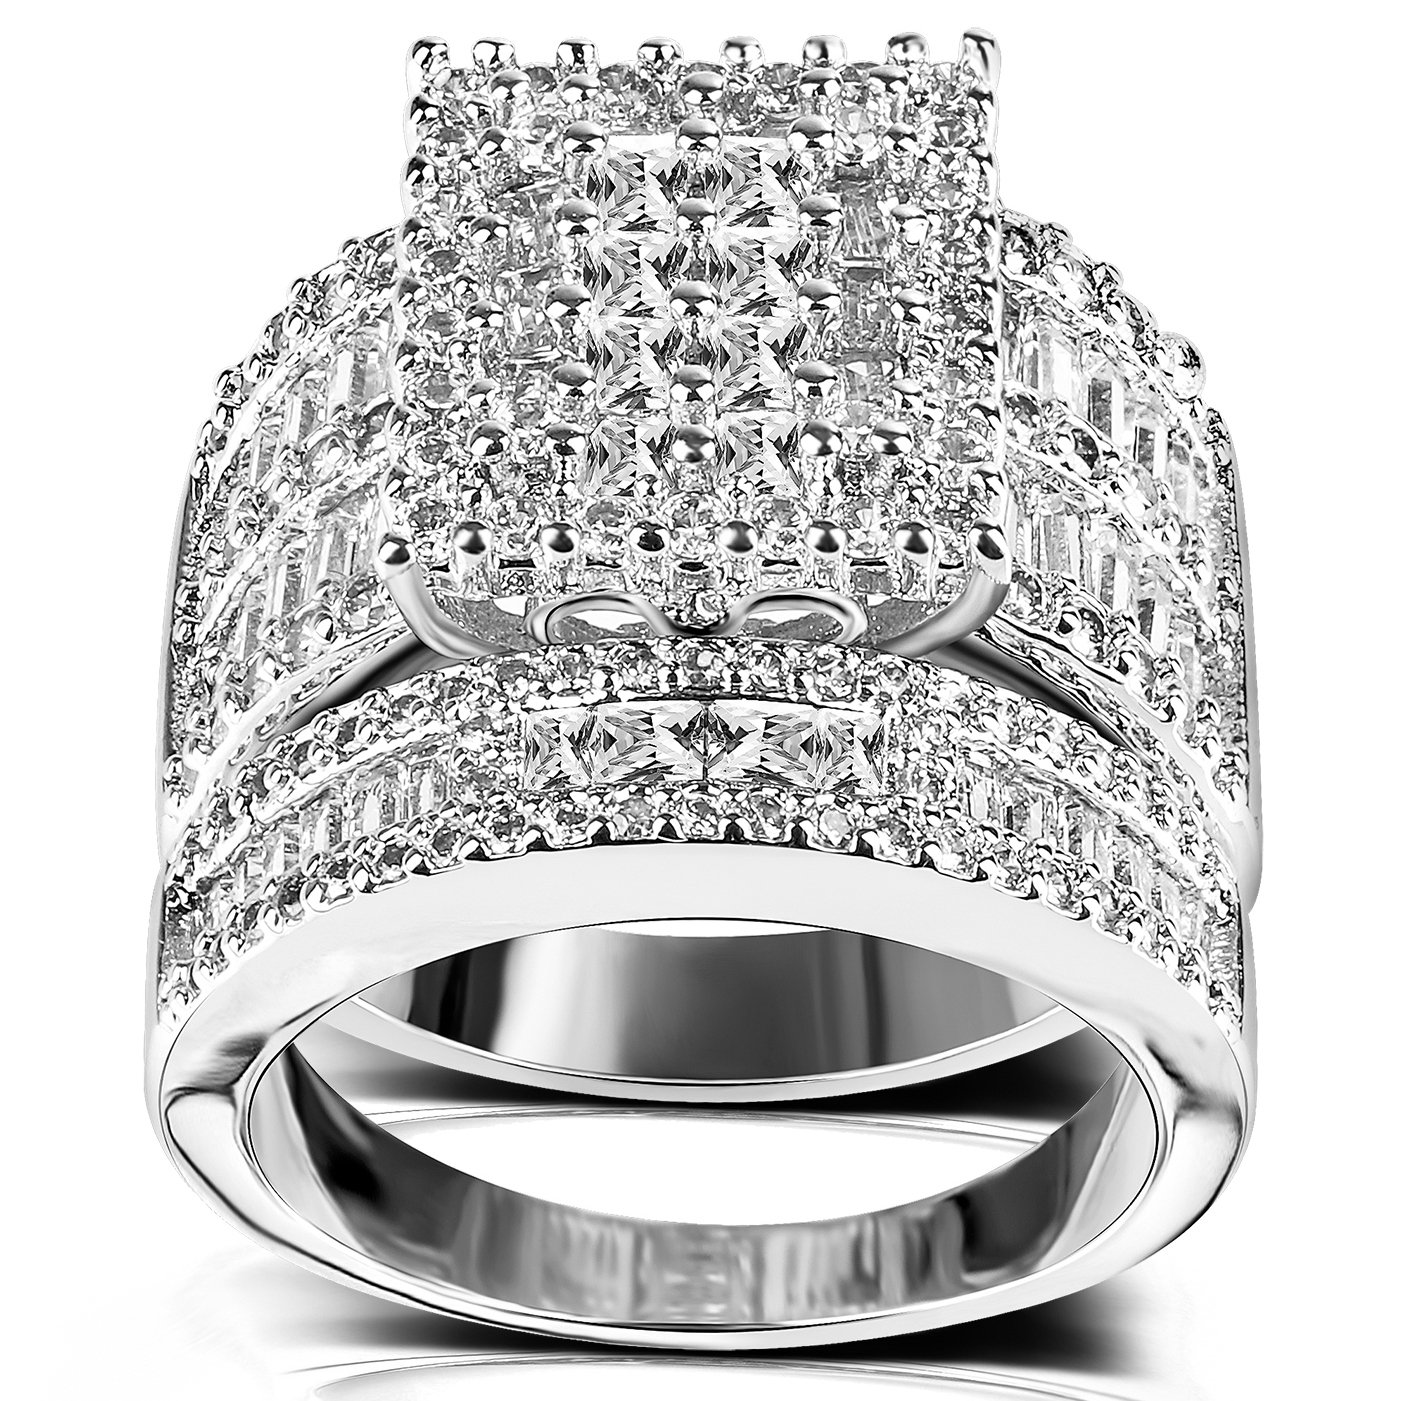 Hiyong 2 PCS Wedding Bridal Sets - Silver Color Women Eco-friendly Jewelry Gift Princess Wedding Eternity Band Rings (10)